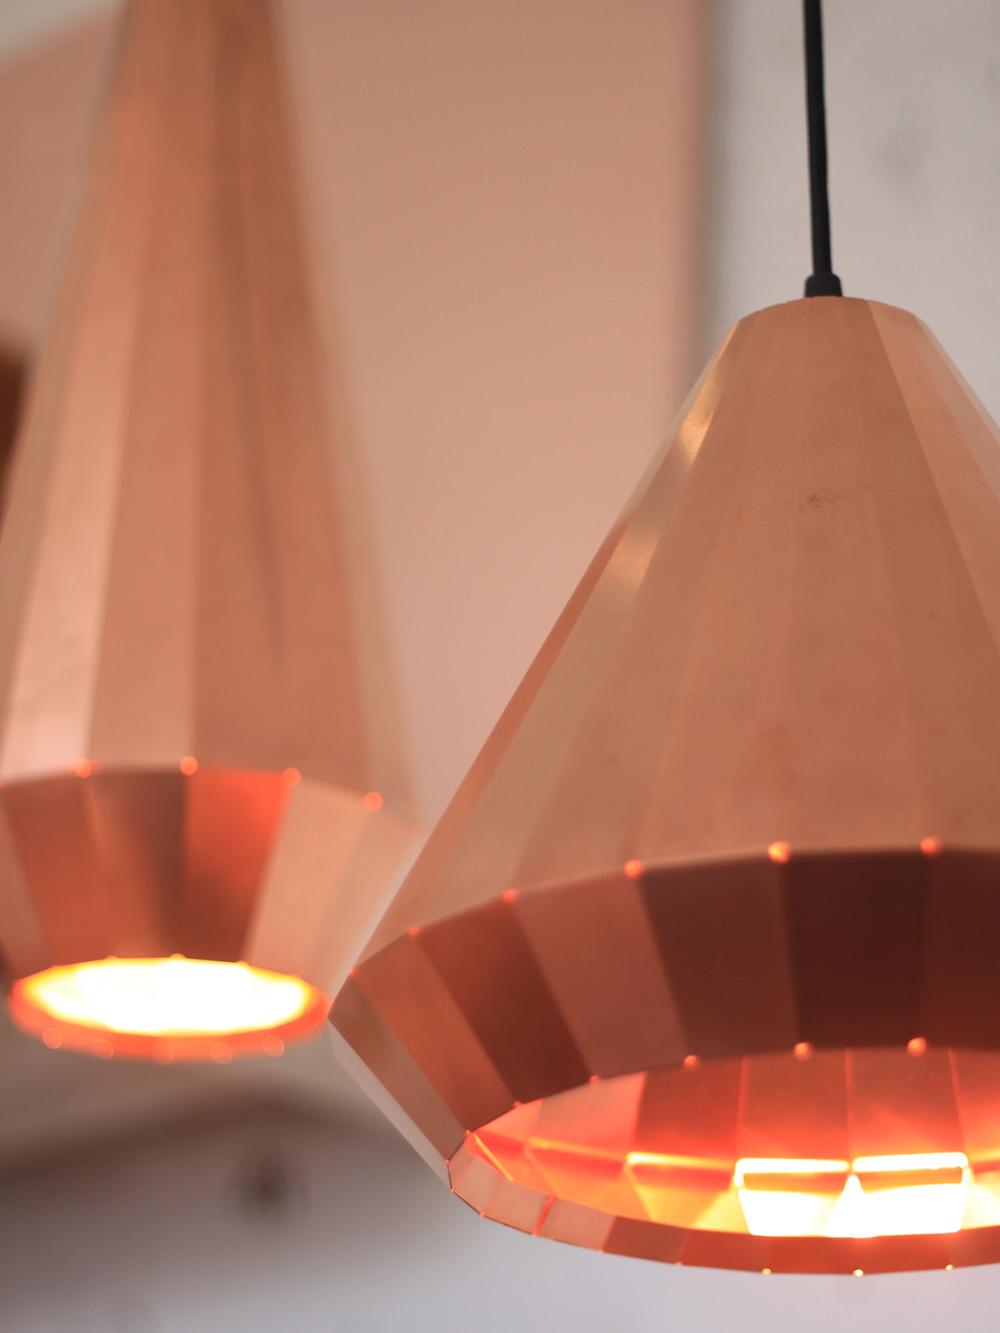 Vij5-Copper-Light-setting-image-by-Vij5-2 RS.jpg